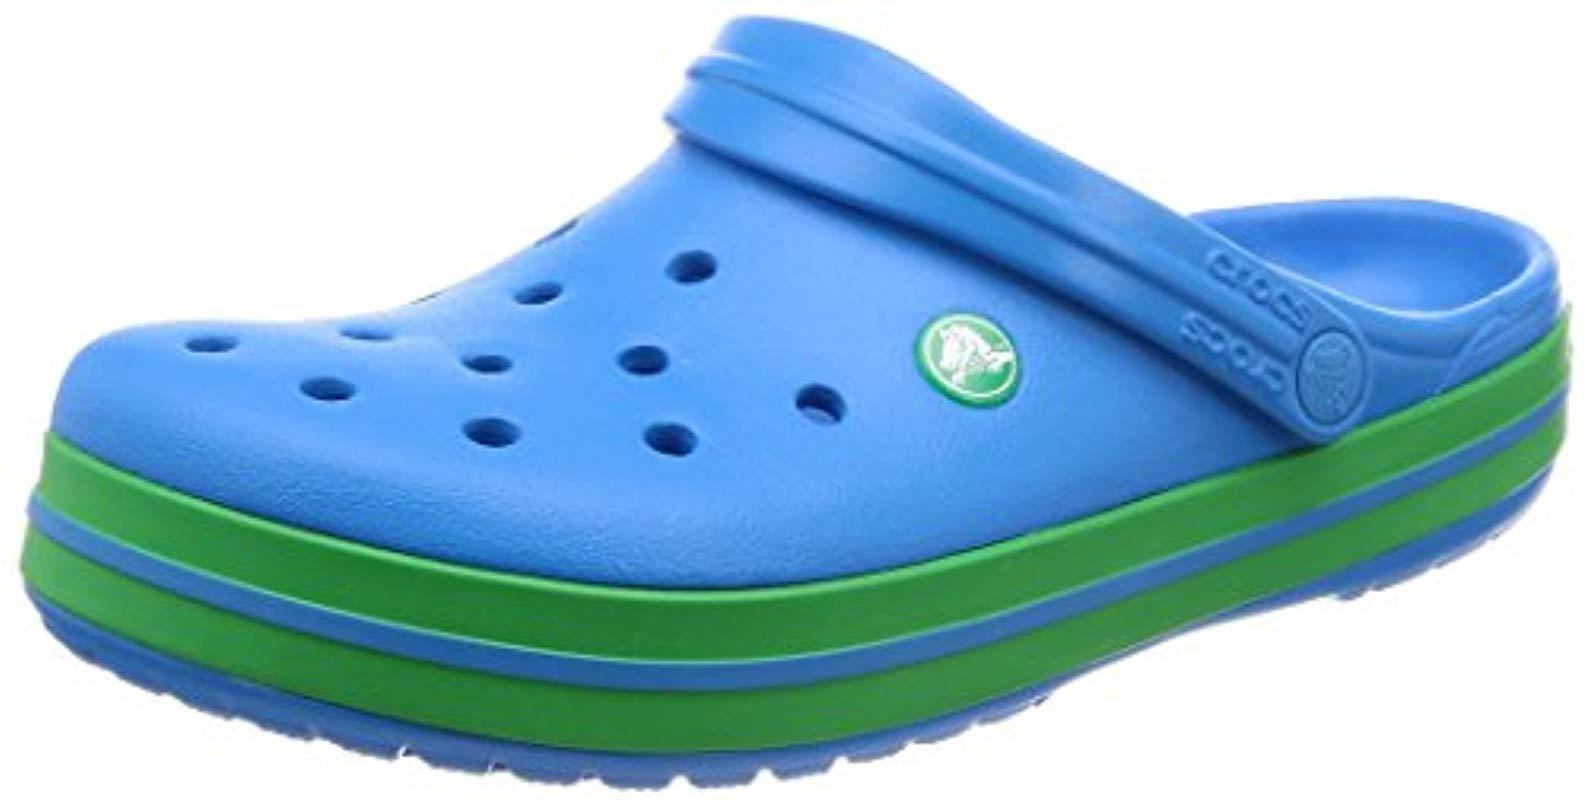 91aee51f277 Crocband, Zuecos Unisex Adulto Crocs™ de hombre de color Azul - Lyst